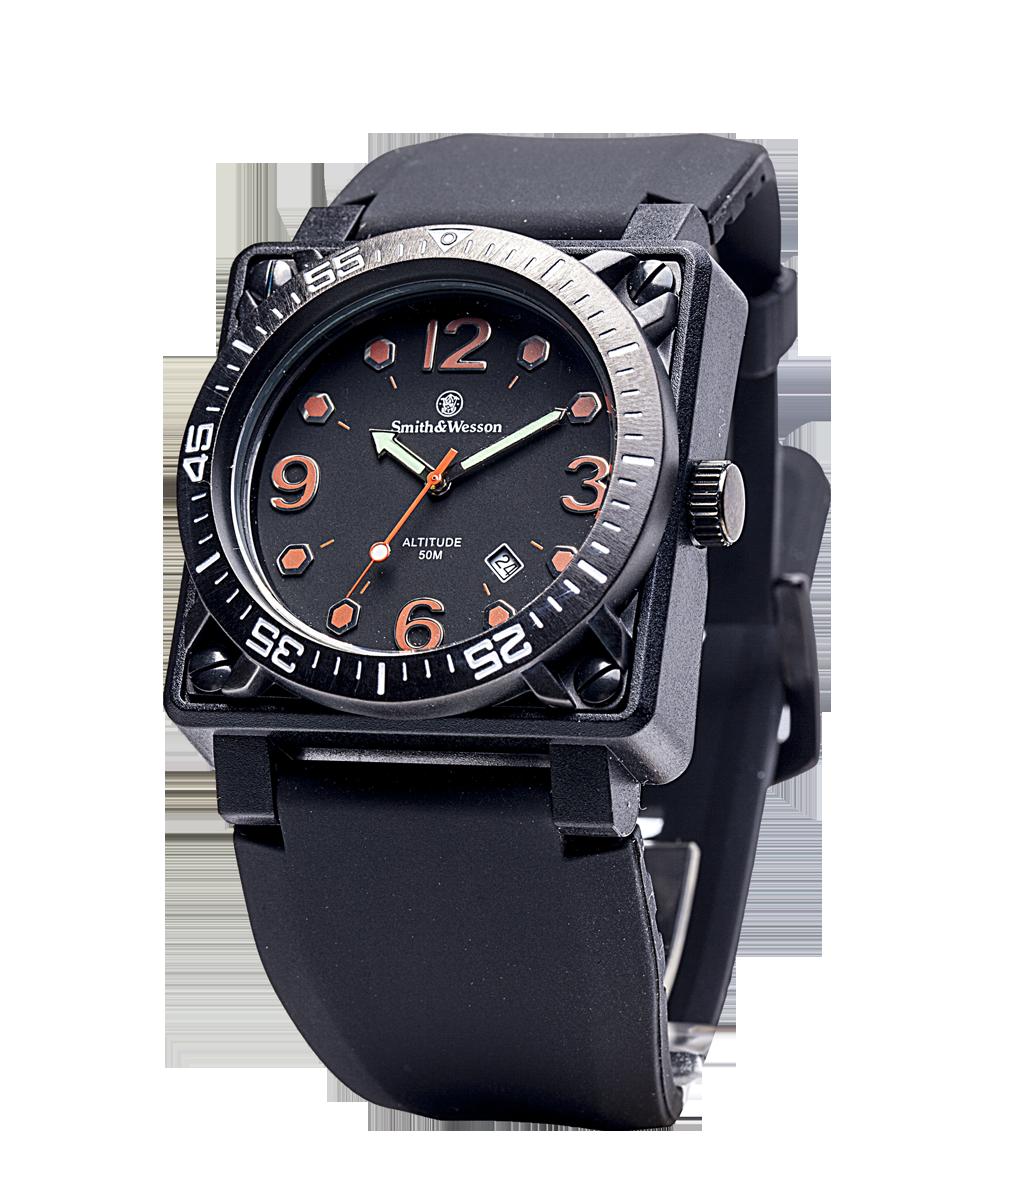 Smith & Wesson Altitude Watch - Black